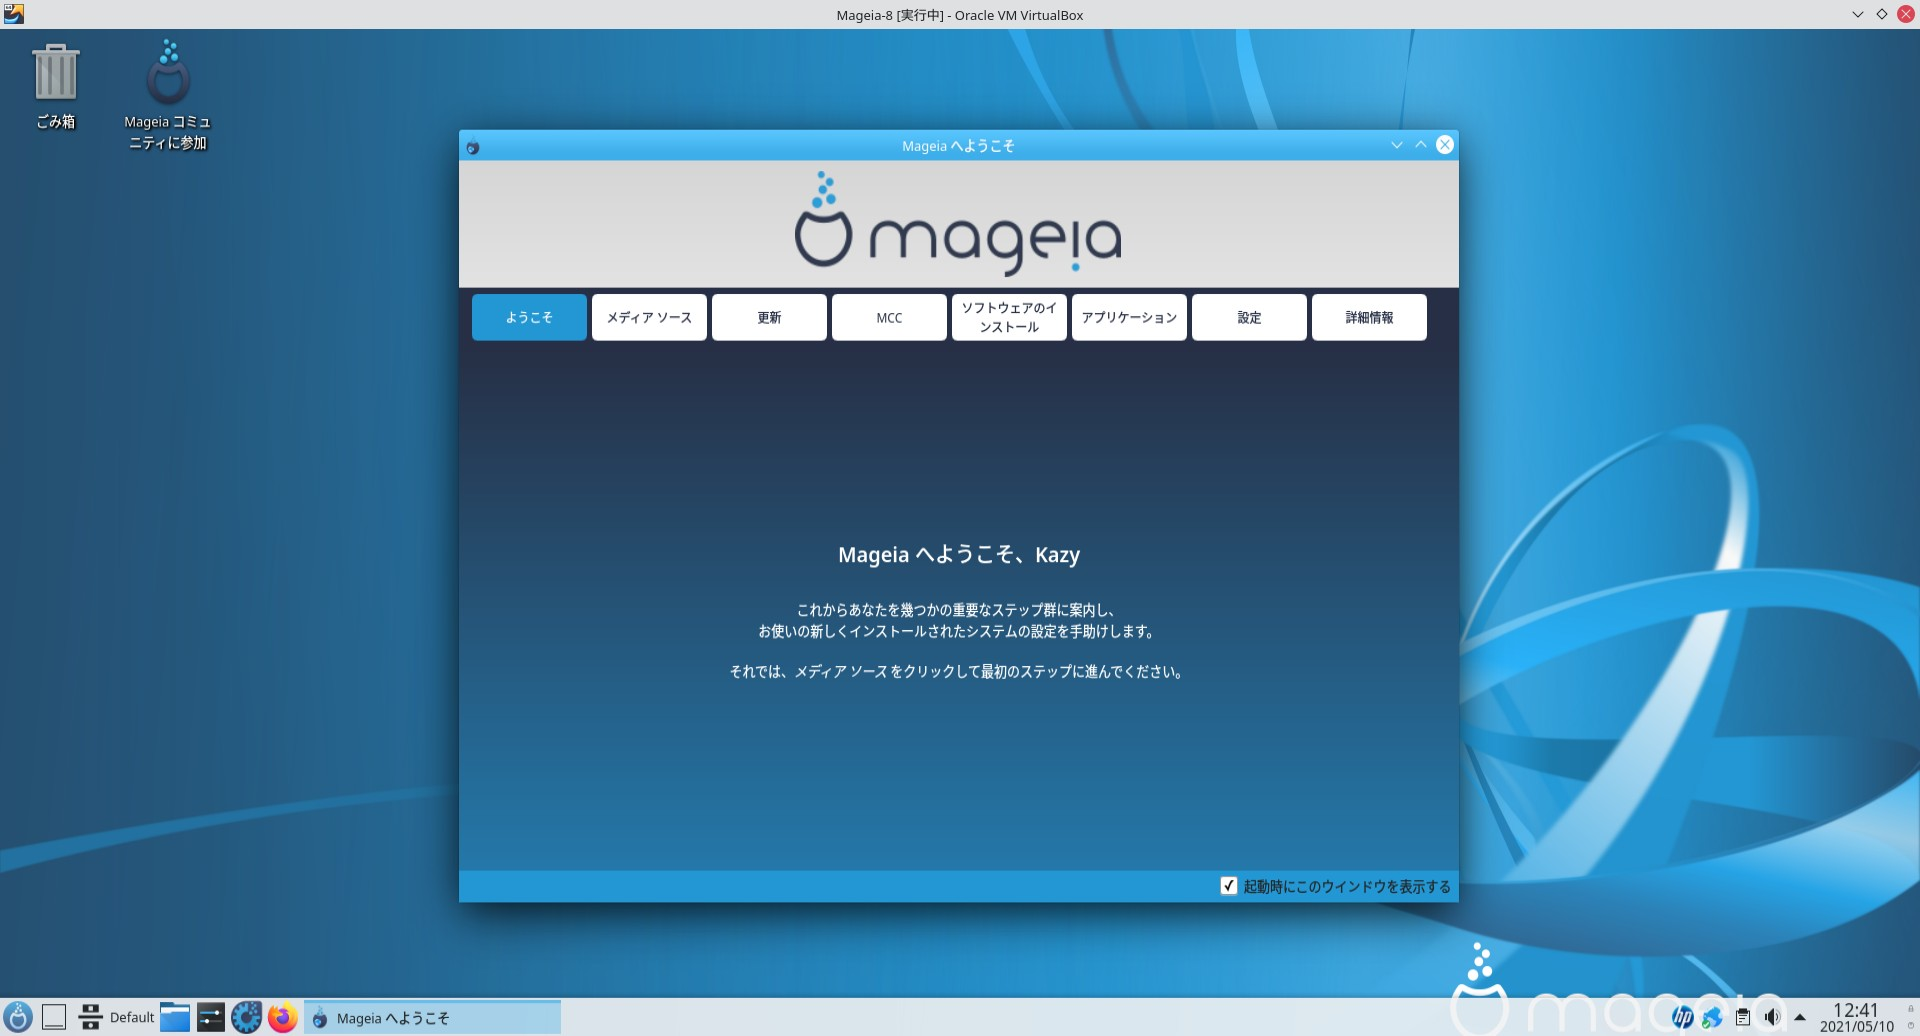 Mageia デスクトップ